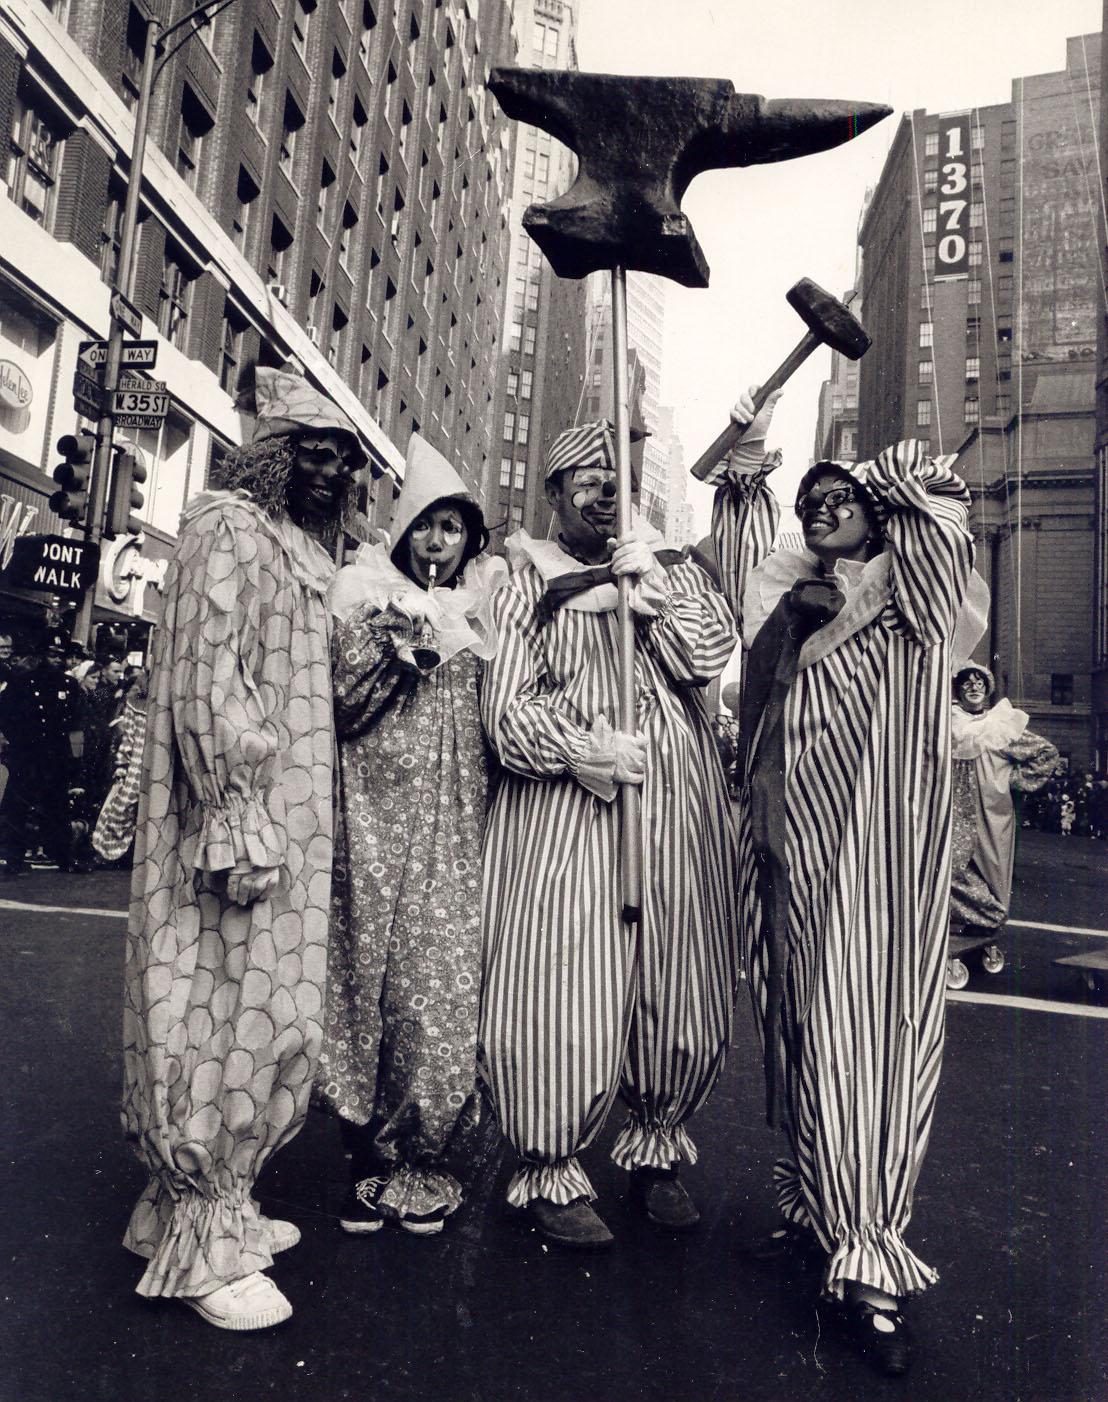 Macys Thanksgiving Day Parade Clowns 1966